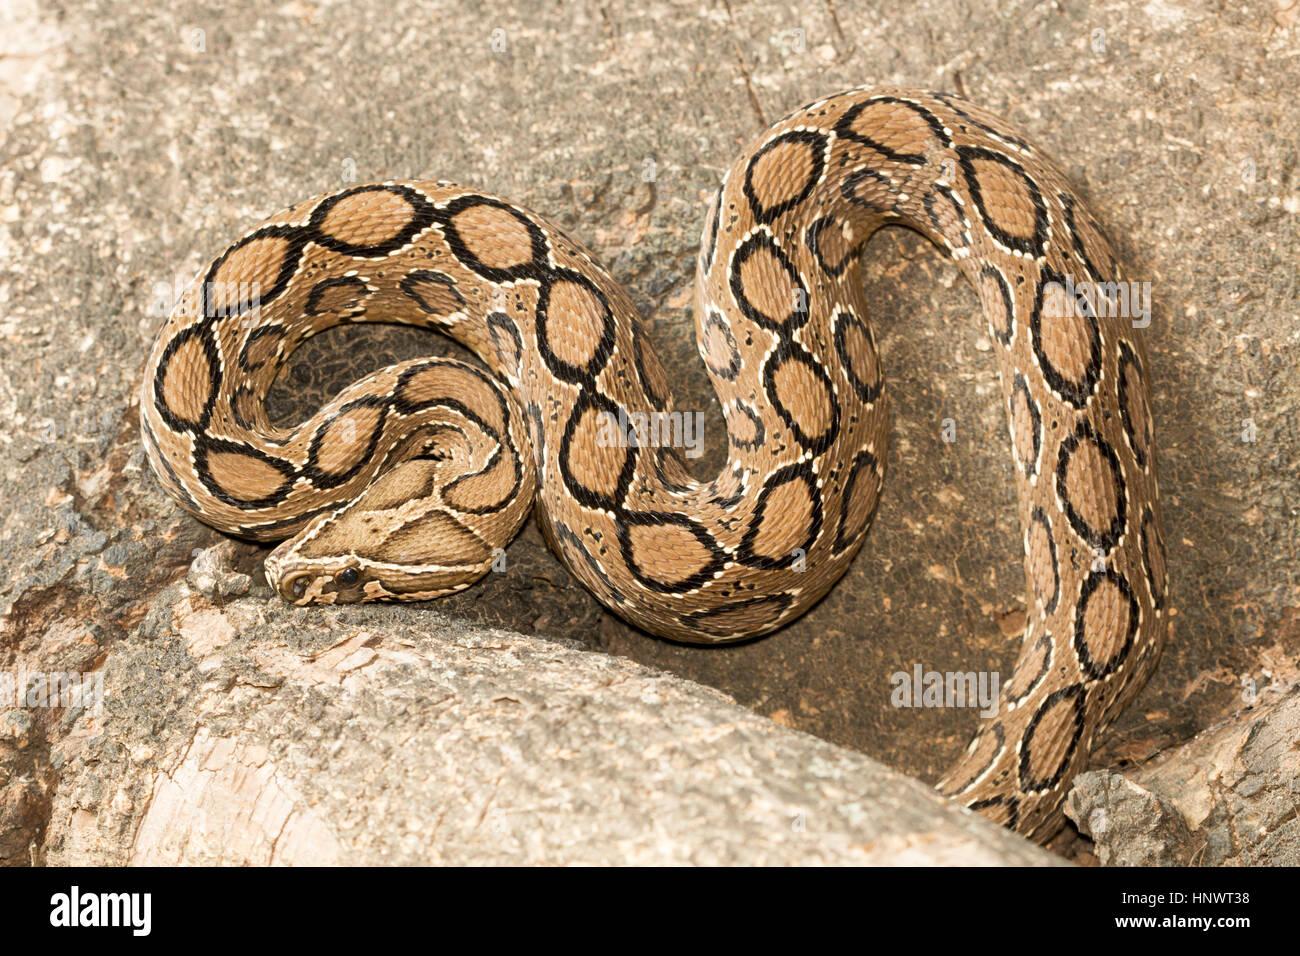 Russell's viper, Daboia russelii, Bangalore, Karnataka. Monotypicgenus ofvenomousOld Worldvipers. The species Stock Photo